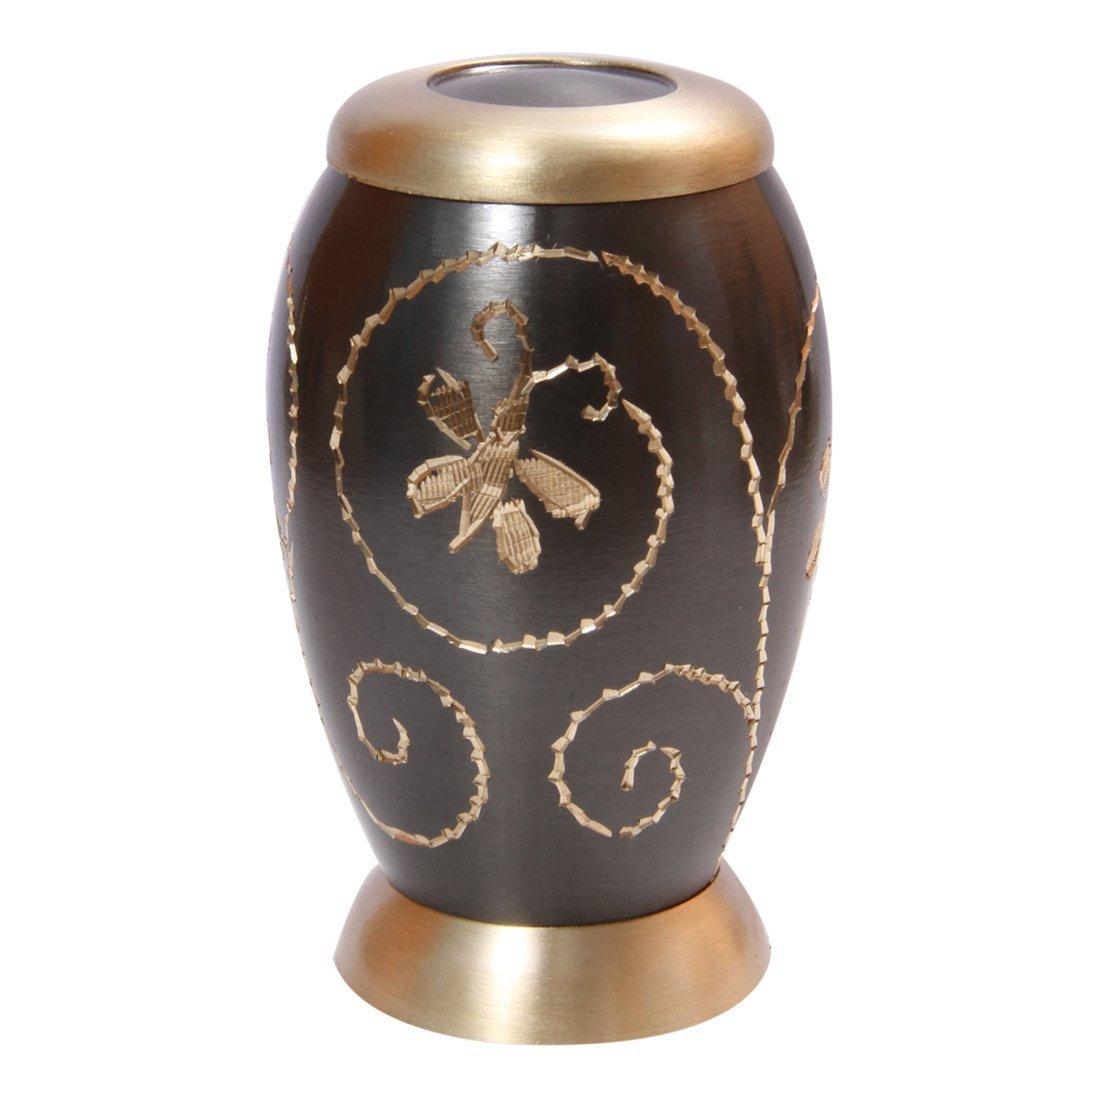 Golden Creeper Engraved Little Keepsake Urn for Human Ashes, Cremation Brass Urns